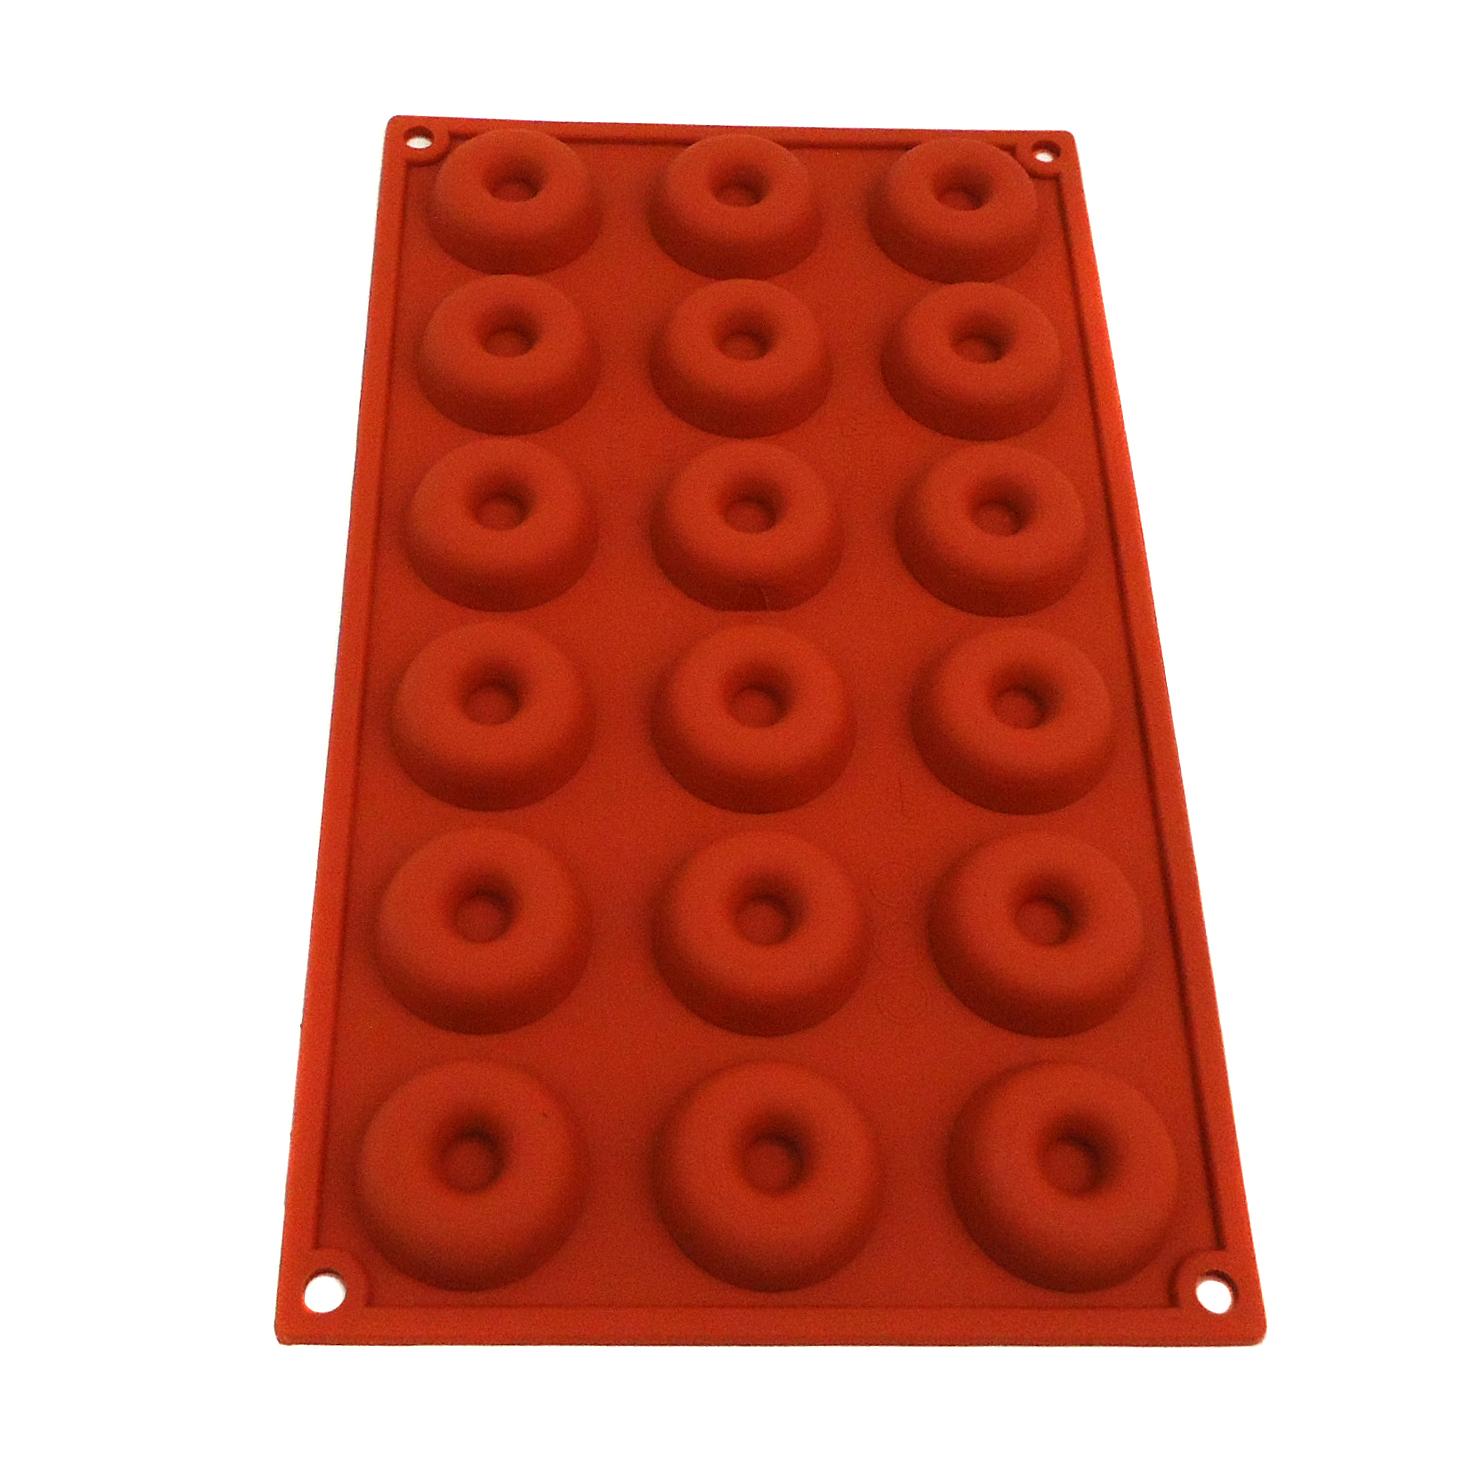 Lacor 66708 Αντικολλητικές Φόρμες Ψησίματος Σιλικόνης Mini Savarin 18 Θέσεων Ø41 επαγγελματικός εξοπλισμός   επαγγελματικά σκεύη είδη σερβιρίσματος   εξαρτήματα